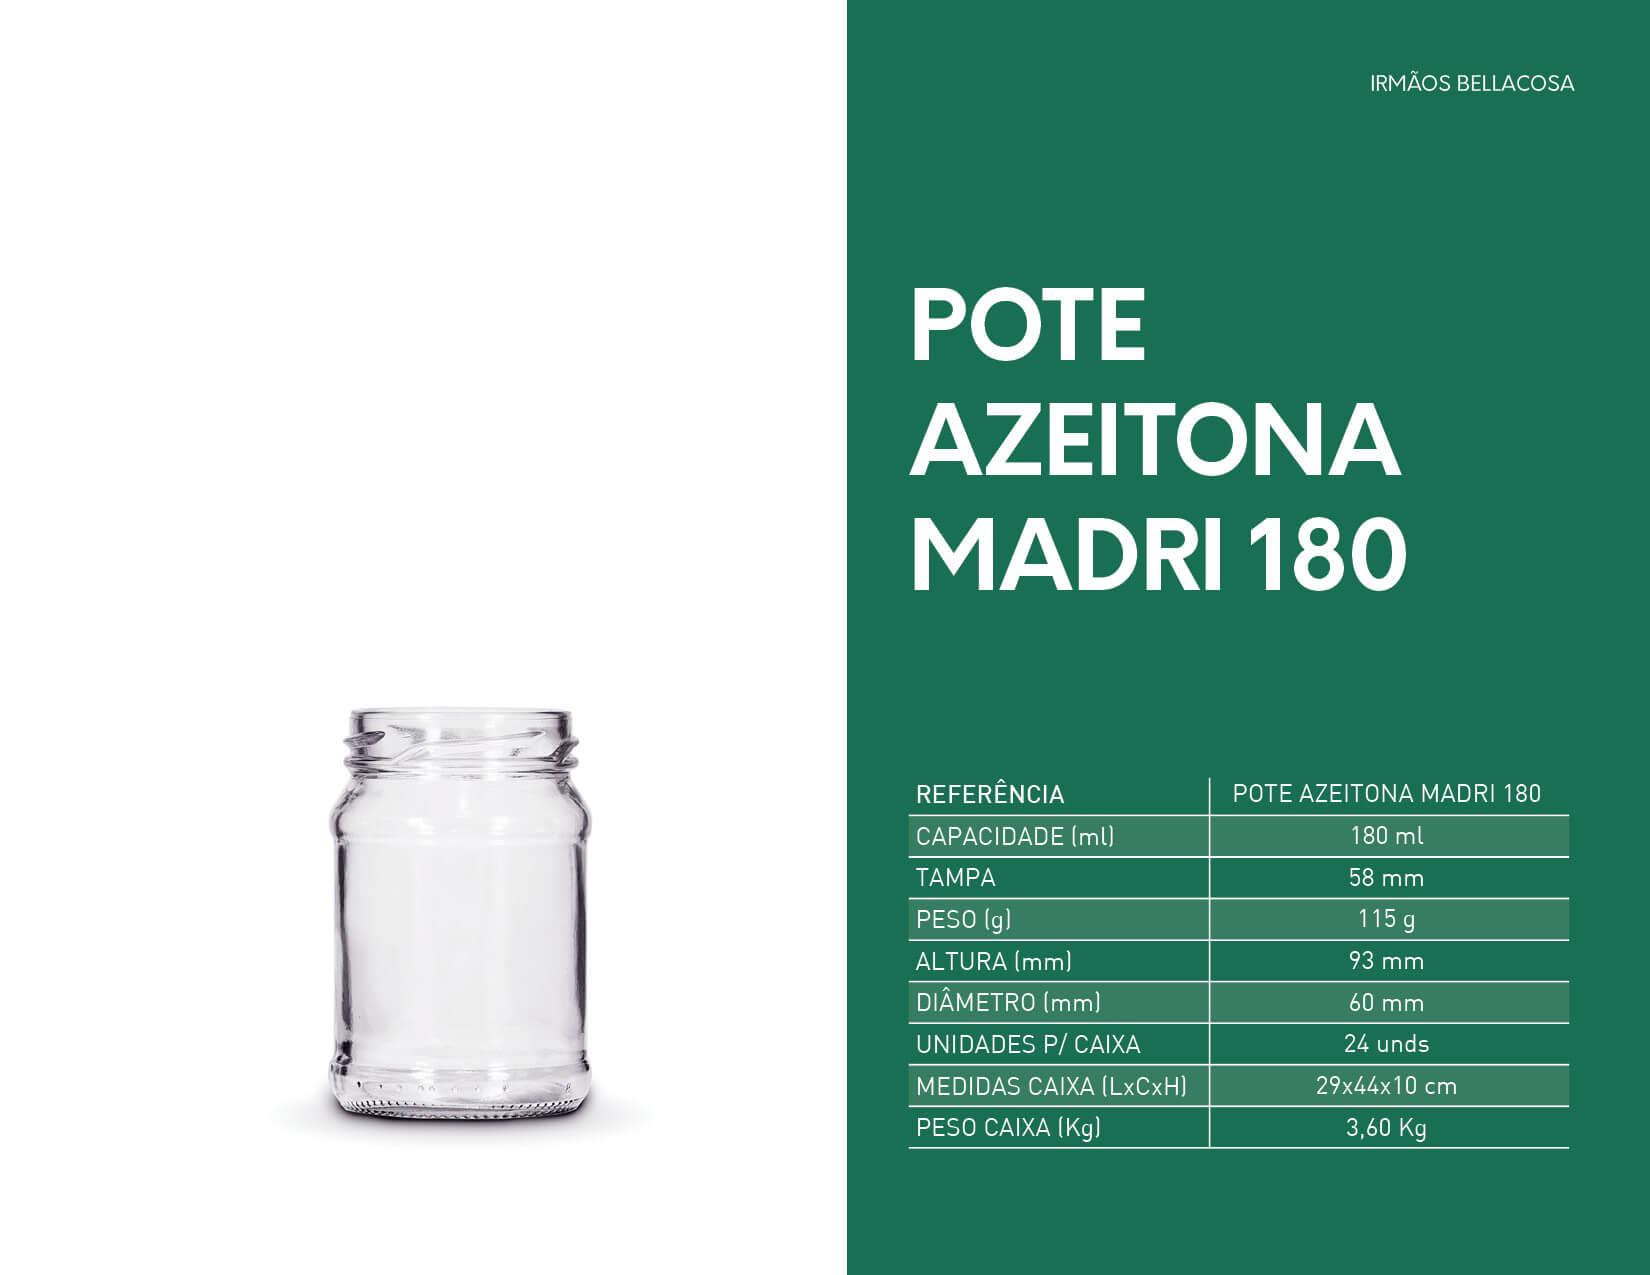 023-Pote-Azeitona-Madri-180-irmaos-bellacosa-embalagens-de-vidro